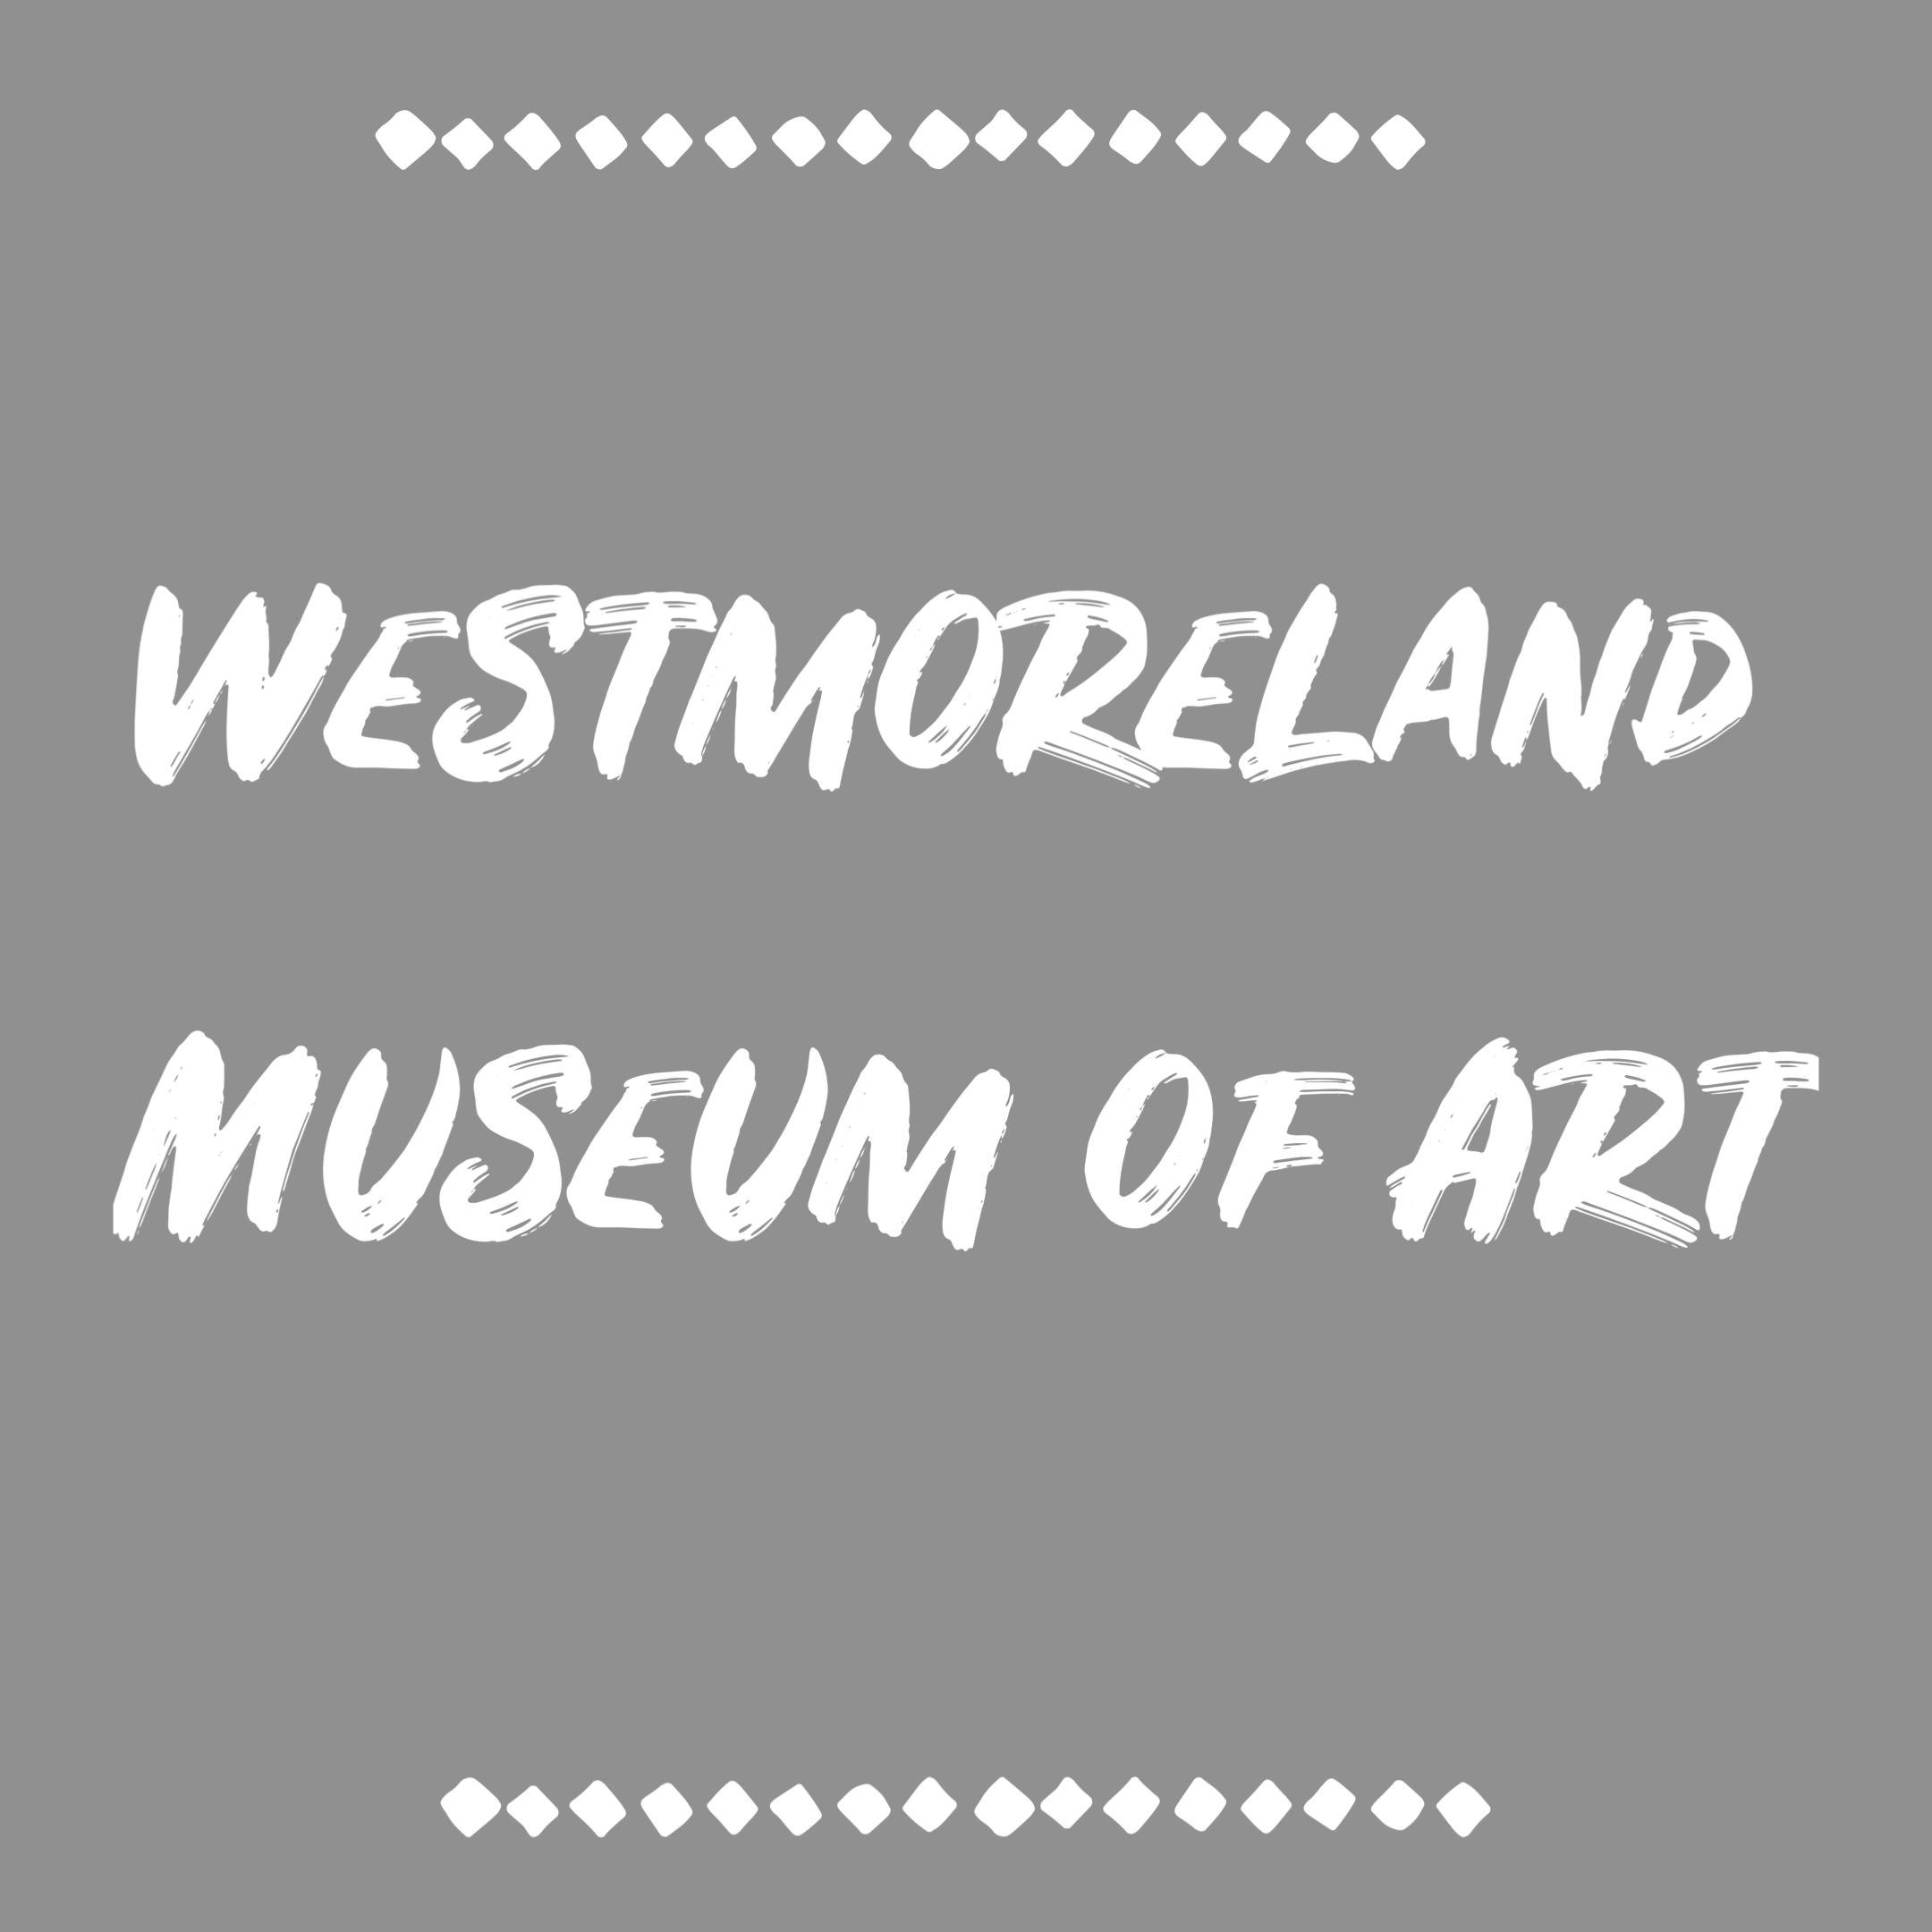 westmoreland museum of art